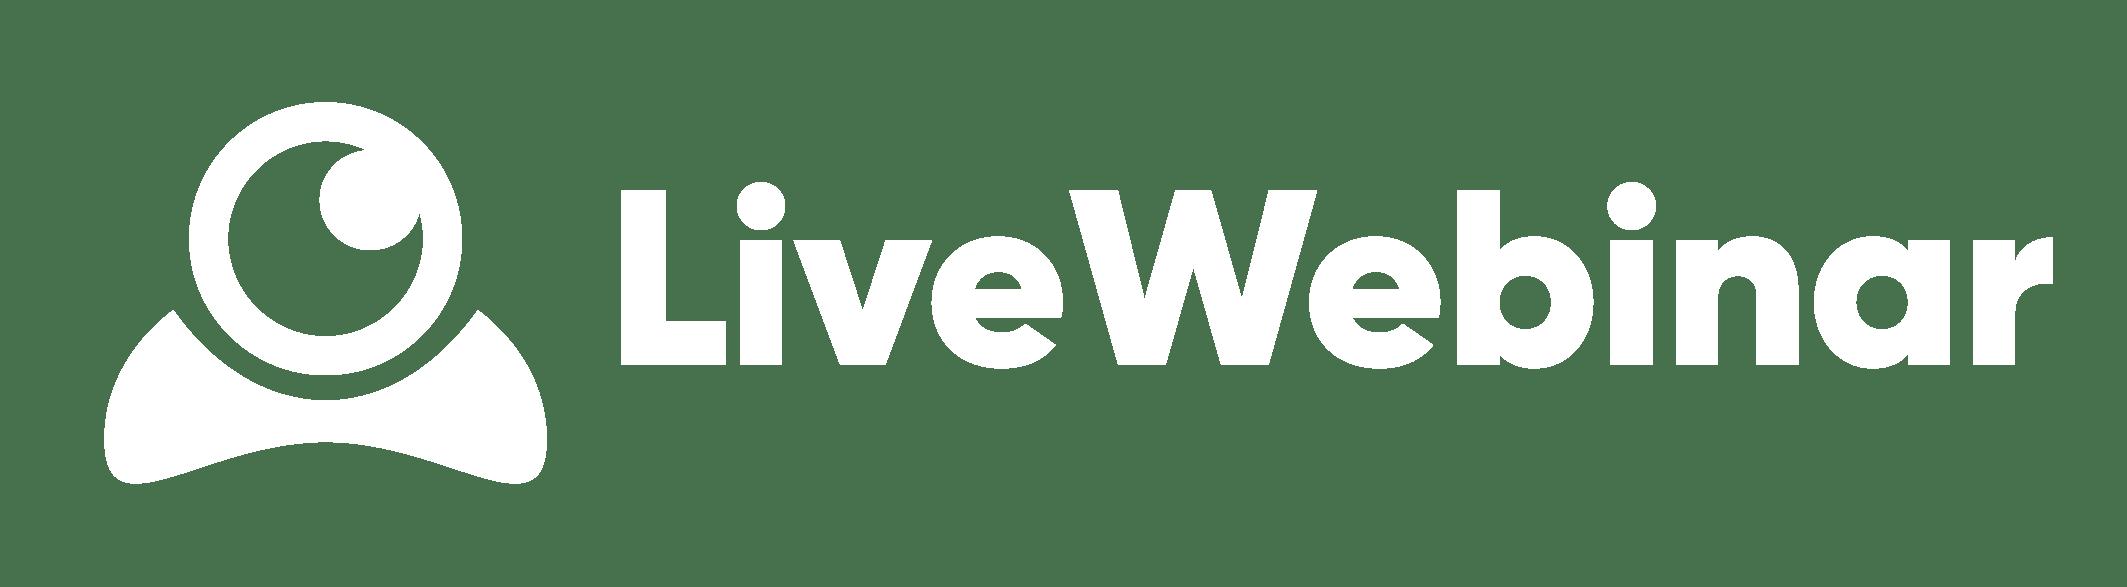 LiveWebinar